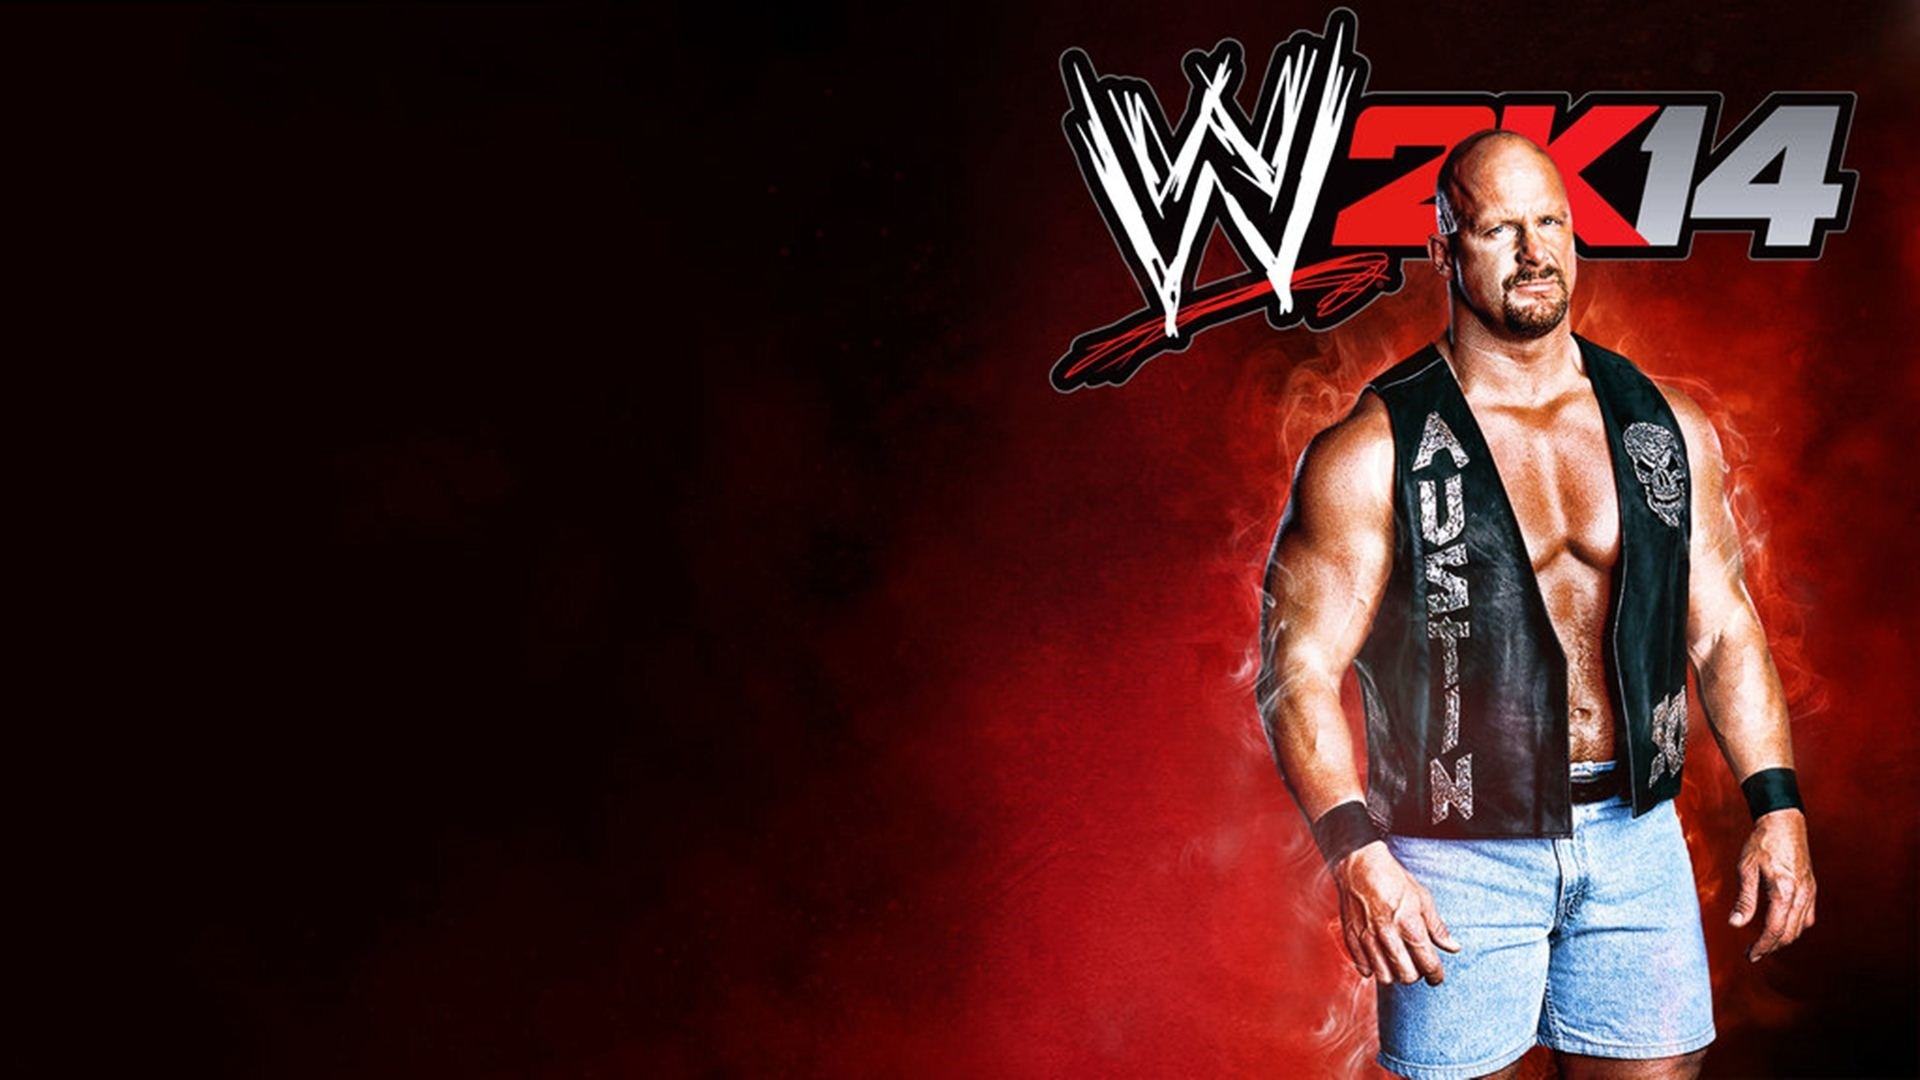 WWE HD Wallpaper (72+ Images